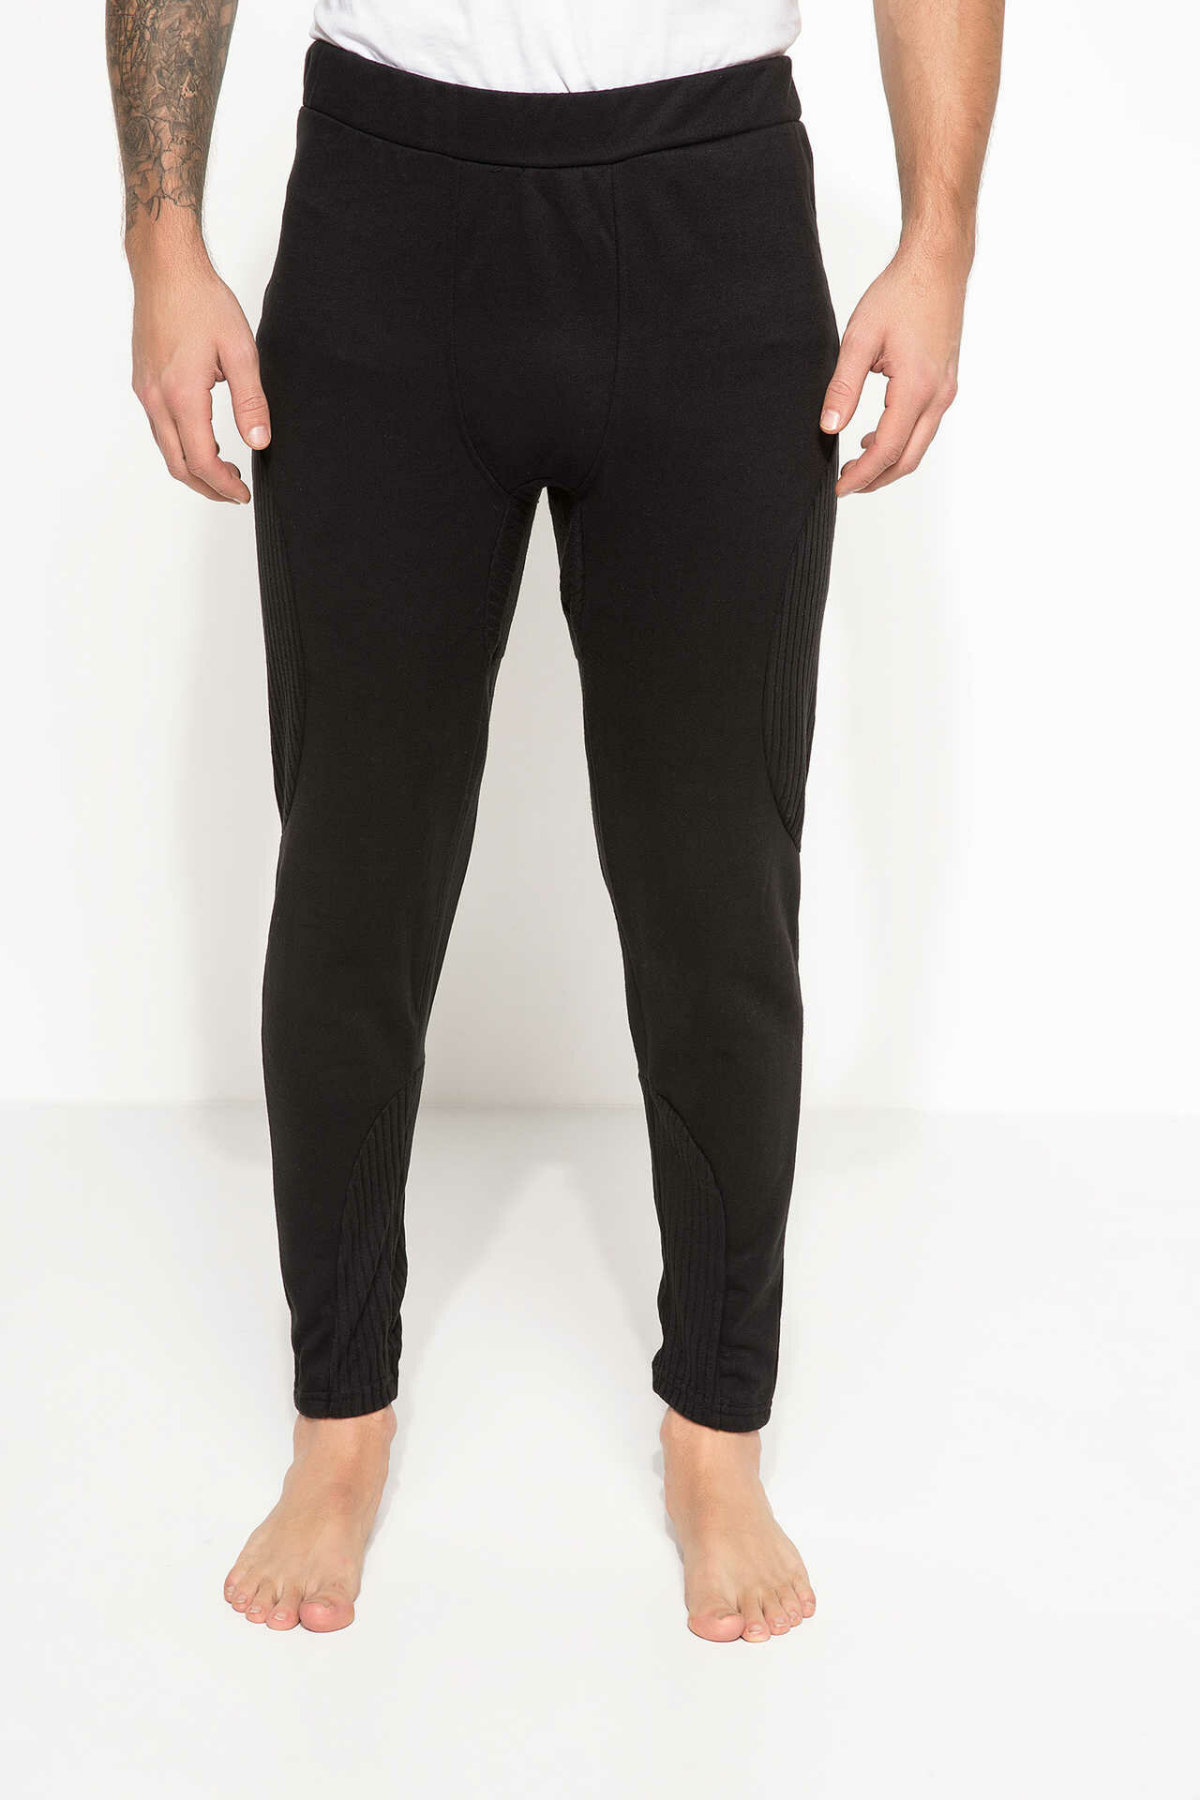 DeFacto Man Winter Elastic Pants Men Casual Black Long Pants Men Loose Pencil Pants Male Bottom Trousers-H7111AZ17WN